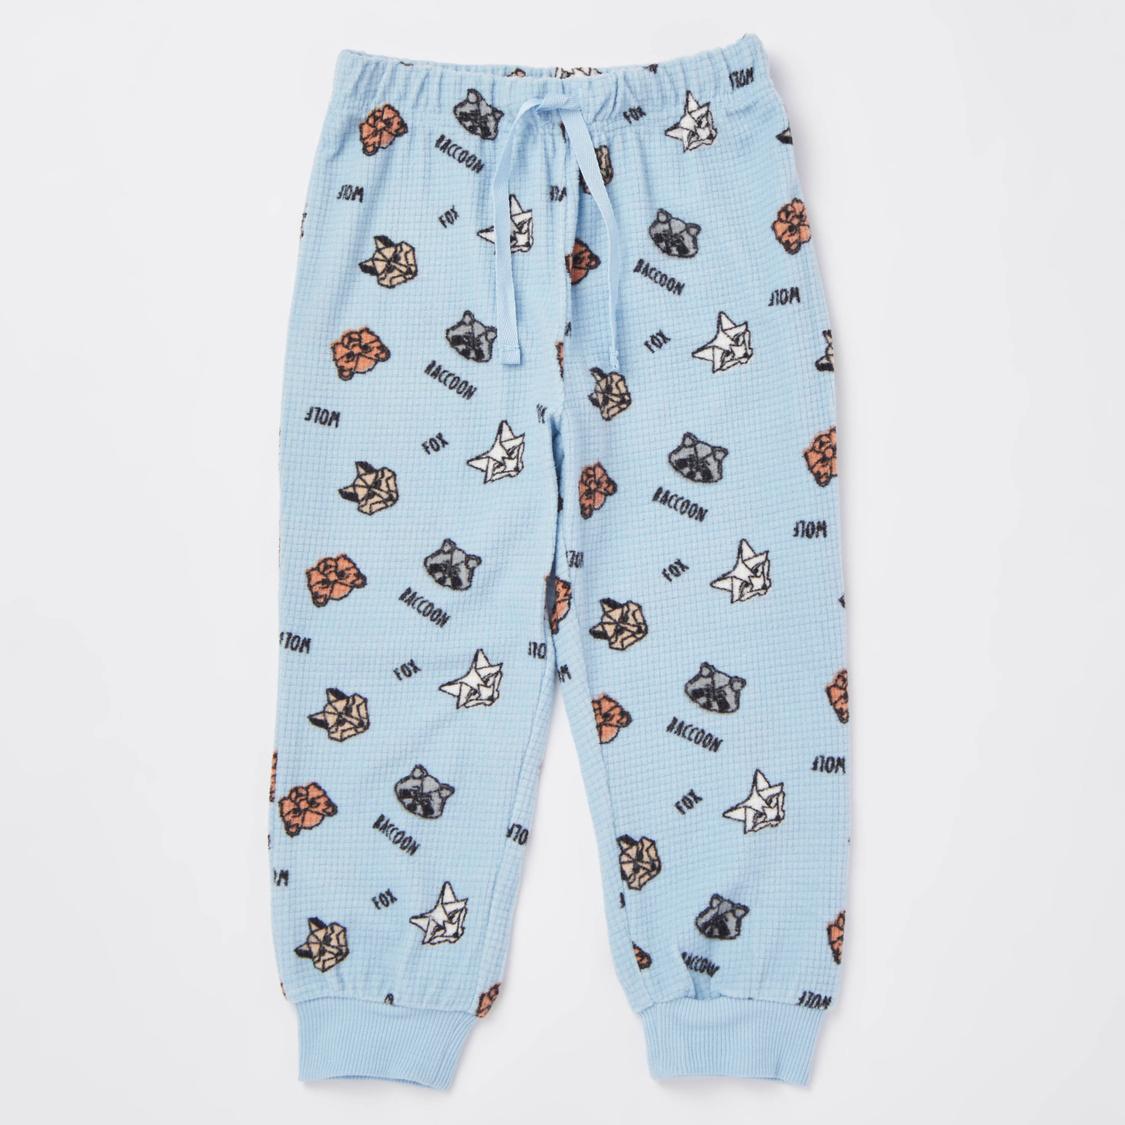 Cozy Collection Racoon Print T-shirt and Full Length Pyjama Set